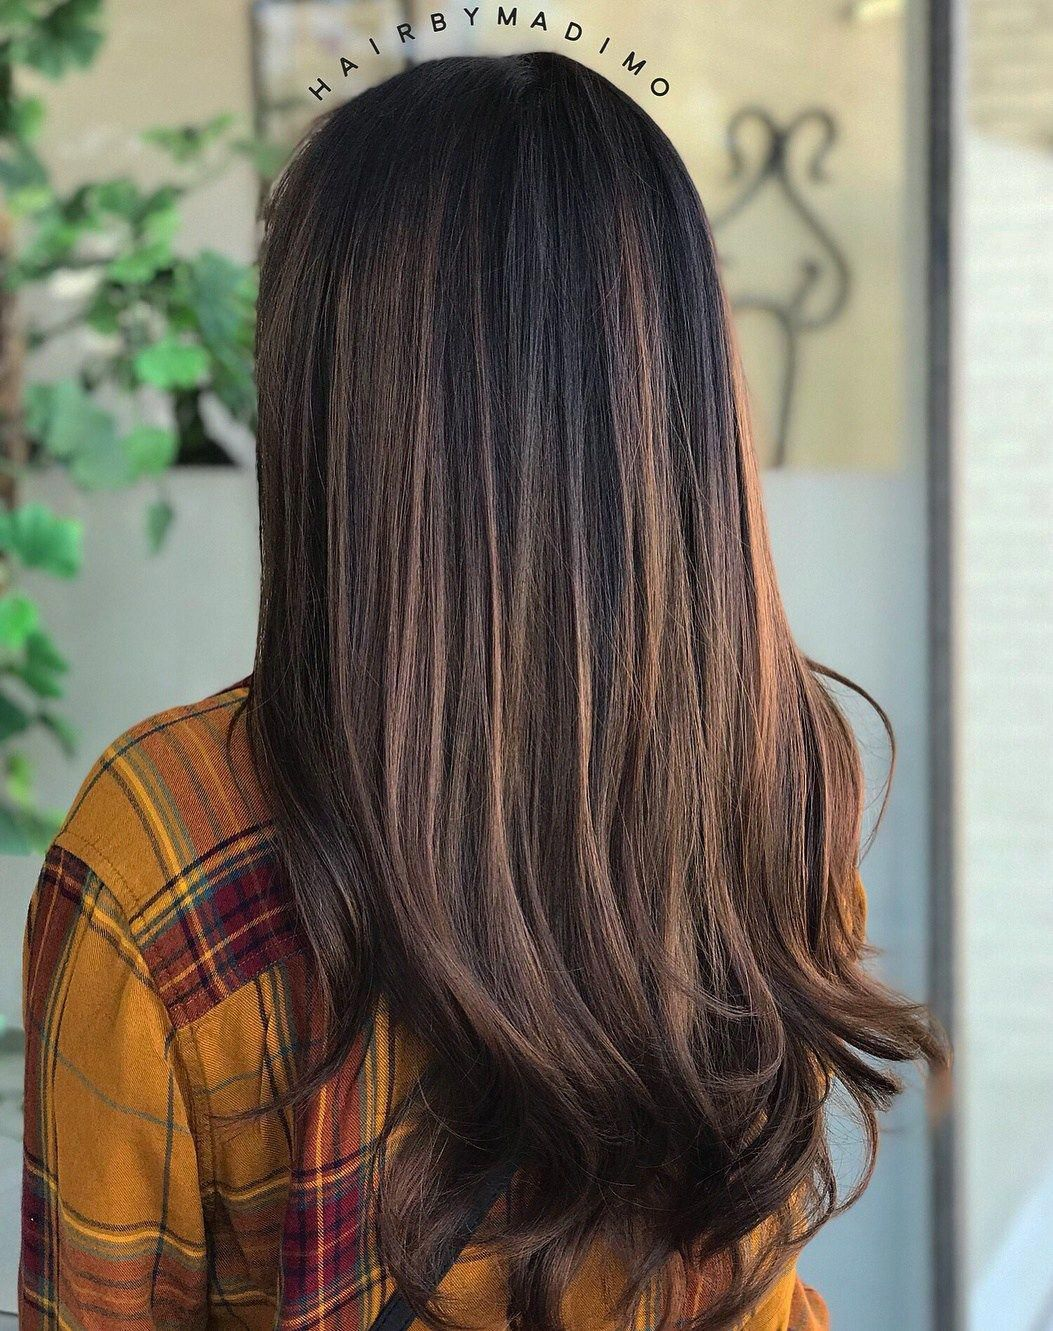 Brushed Chocolate Highlights For Straight Black Hair Darkbrunettehair Hair Color For Black Hair Black Hair With Highlights Brunette Hair Color